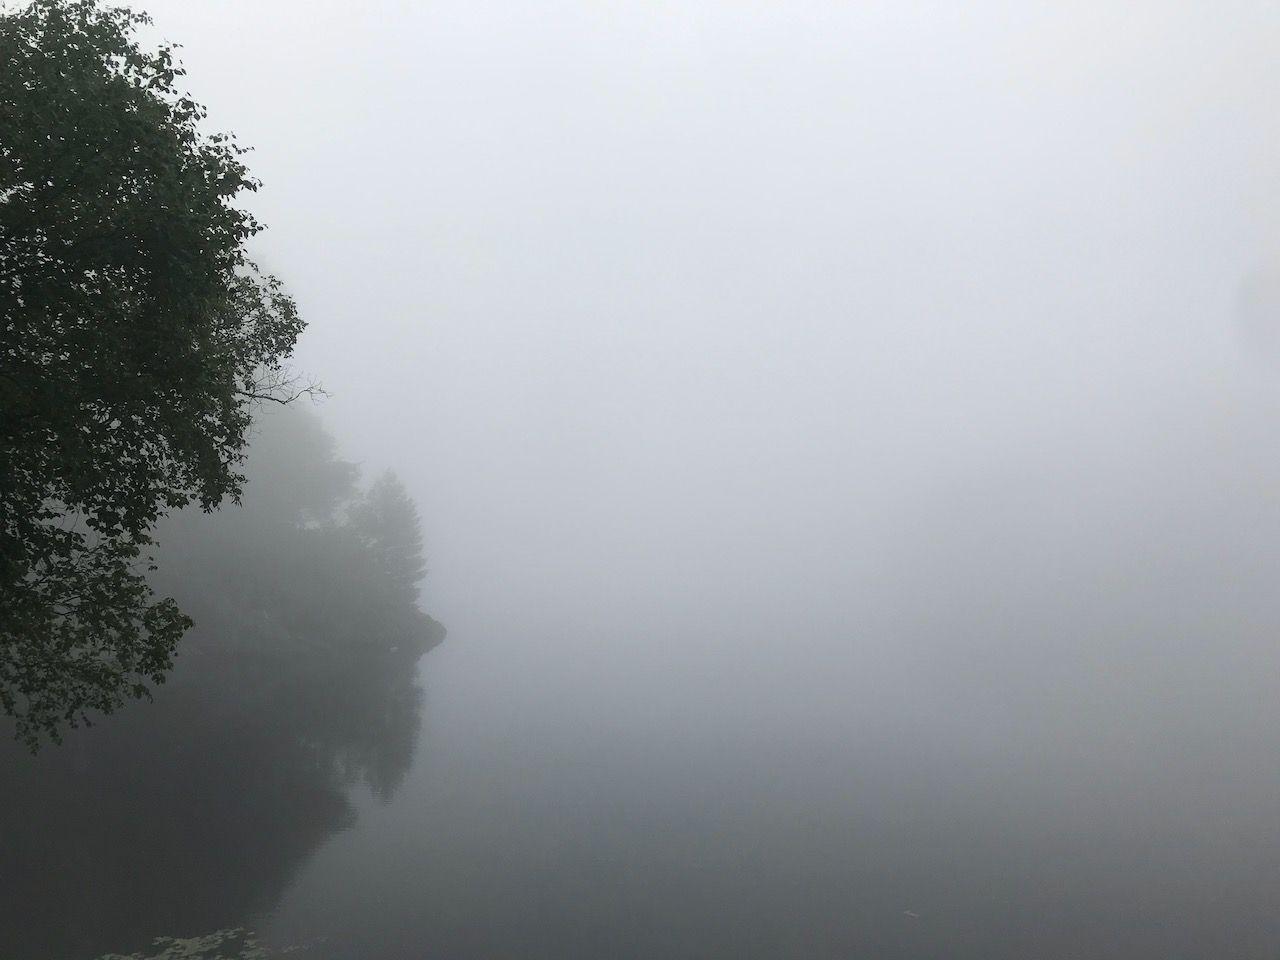 Morning Mist in Muskoka